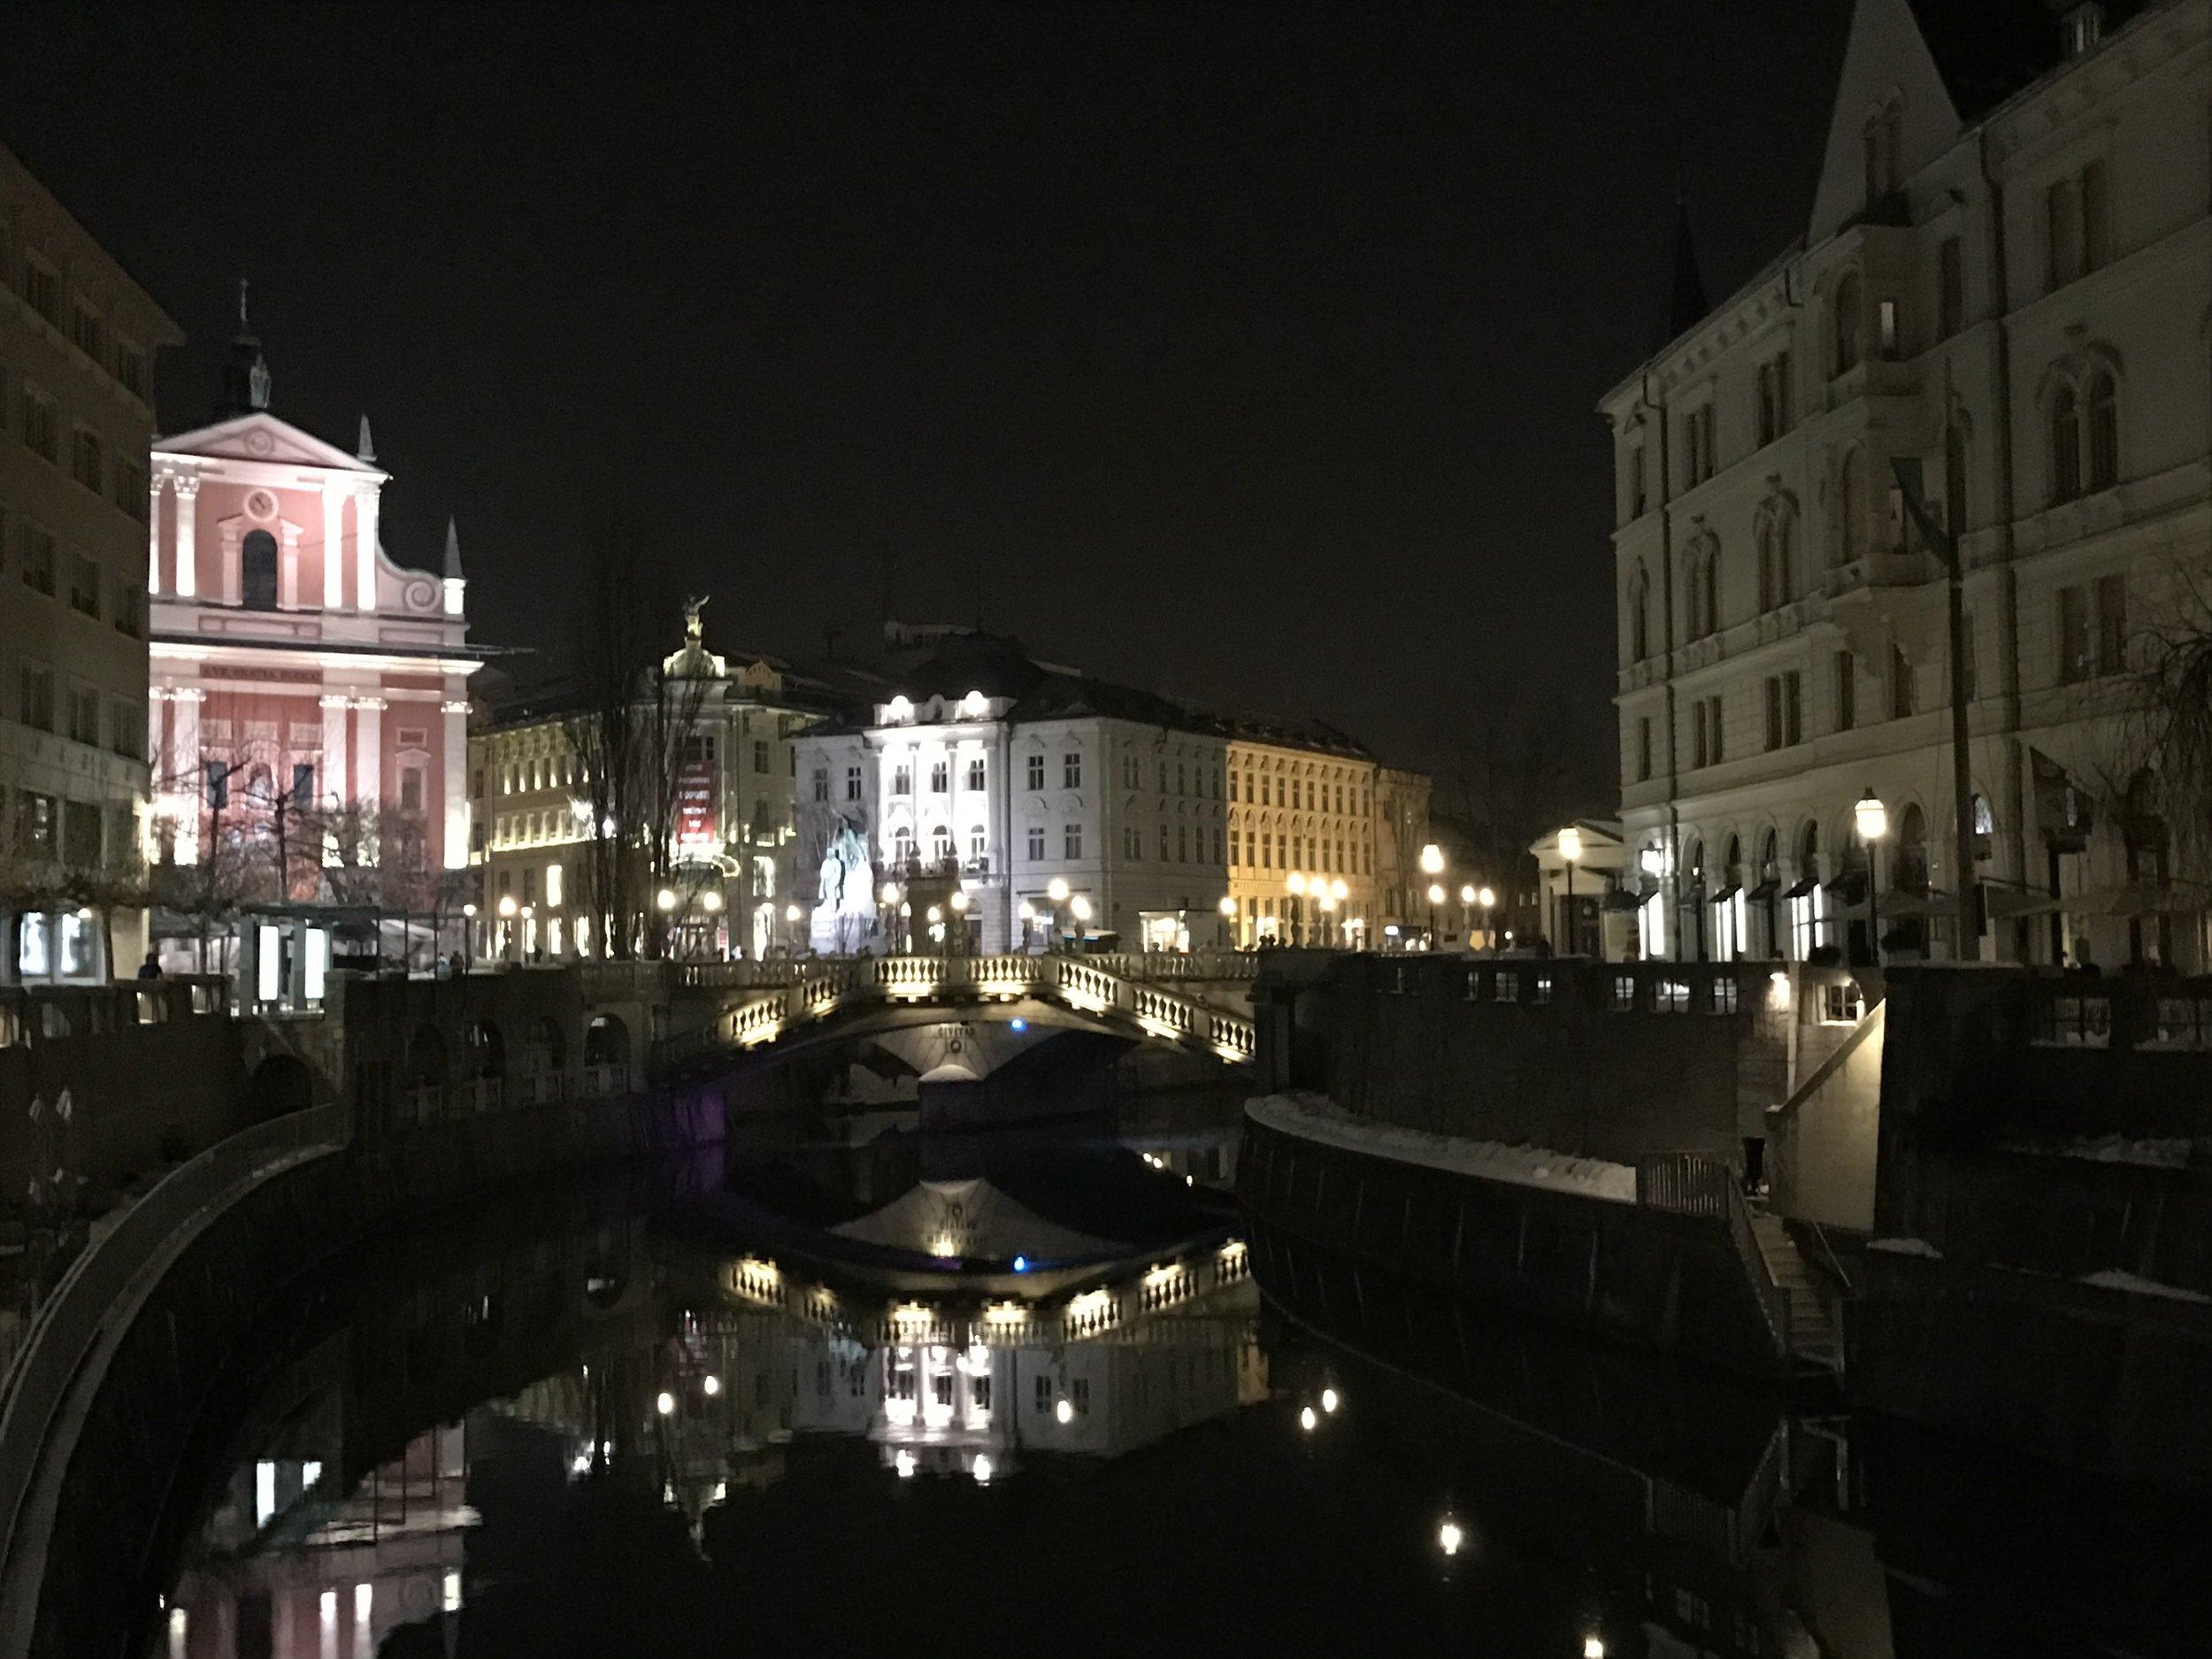 Ljubljana by night, featuring the illumination of the Triple Bridge.